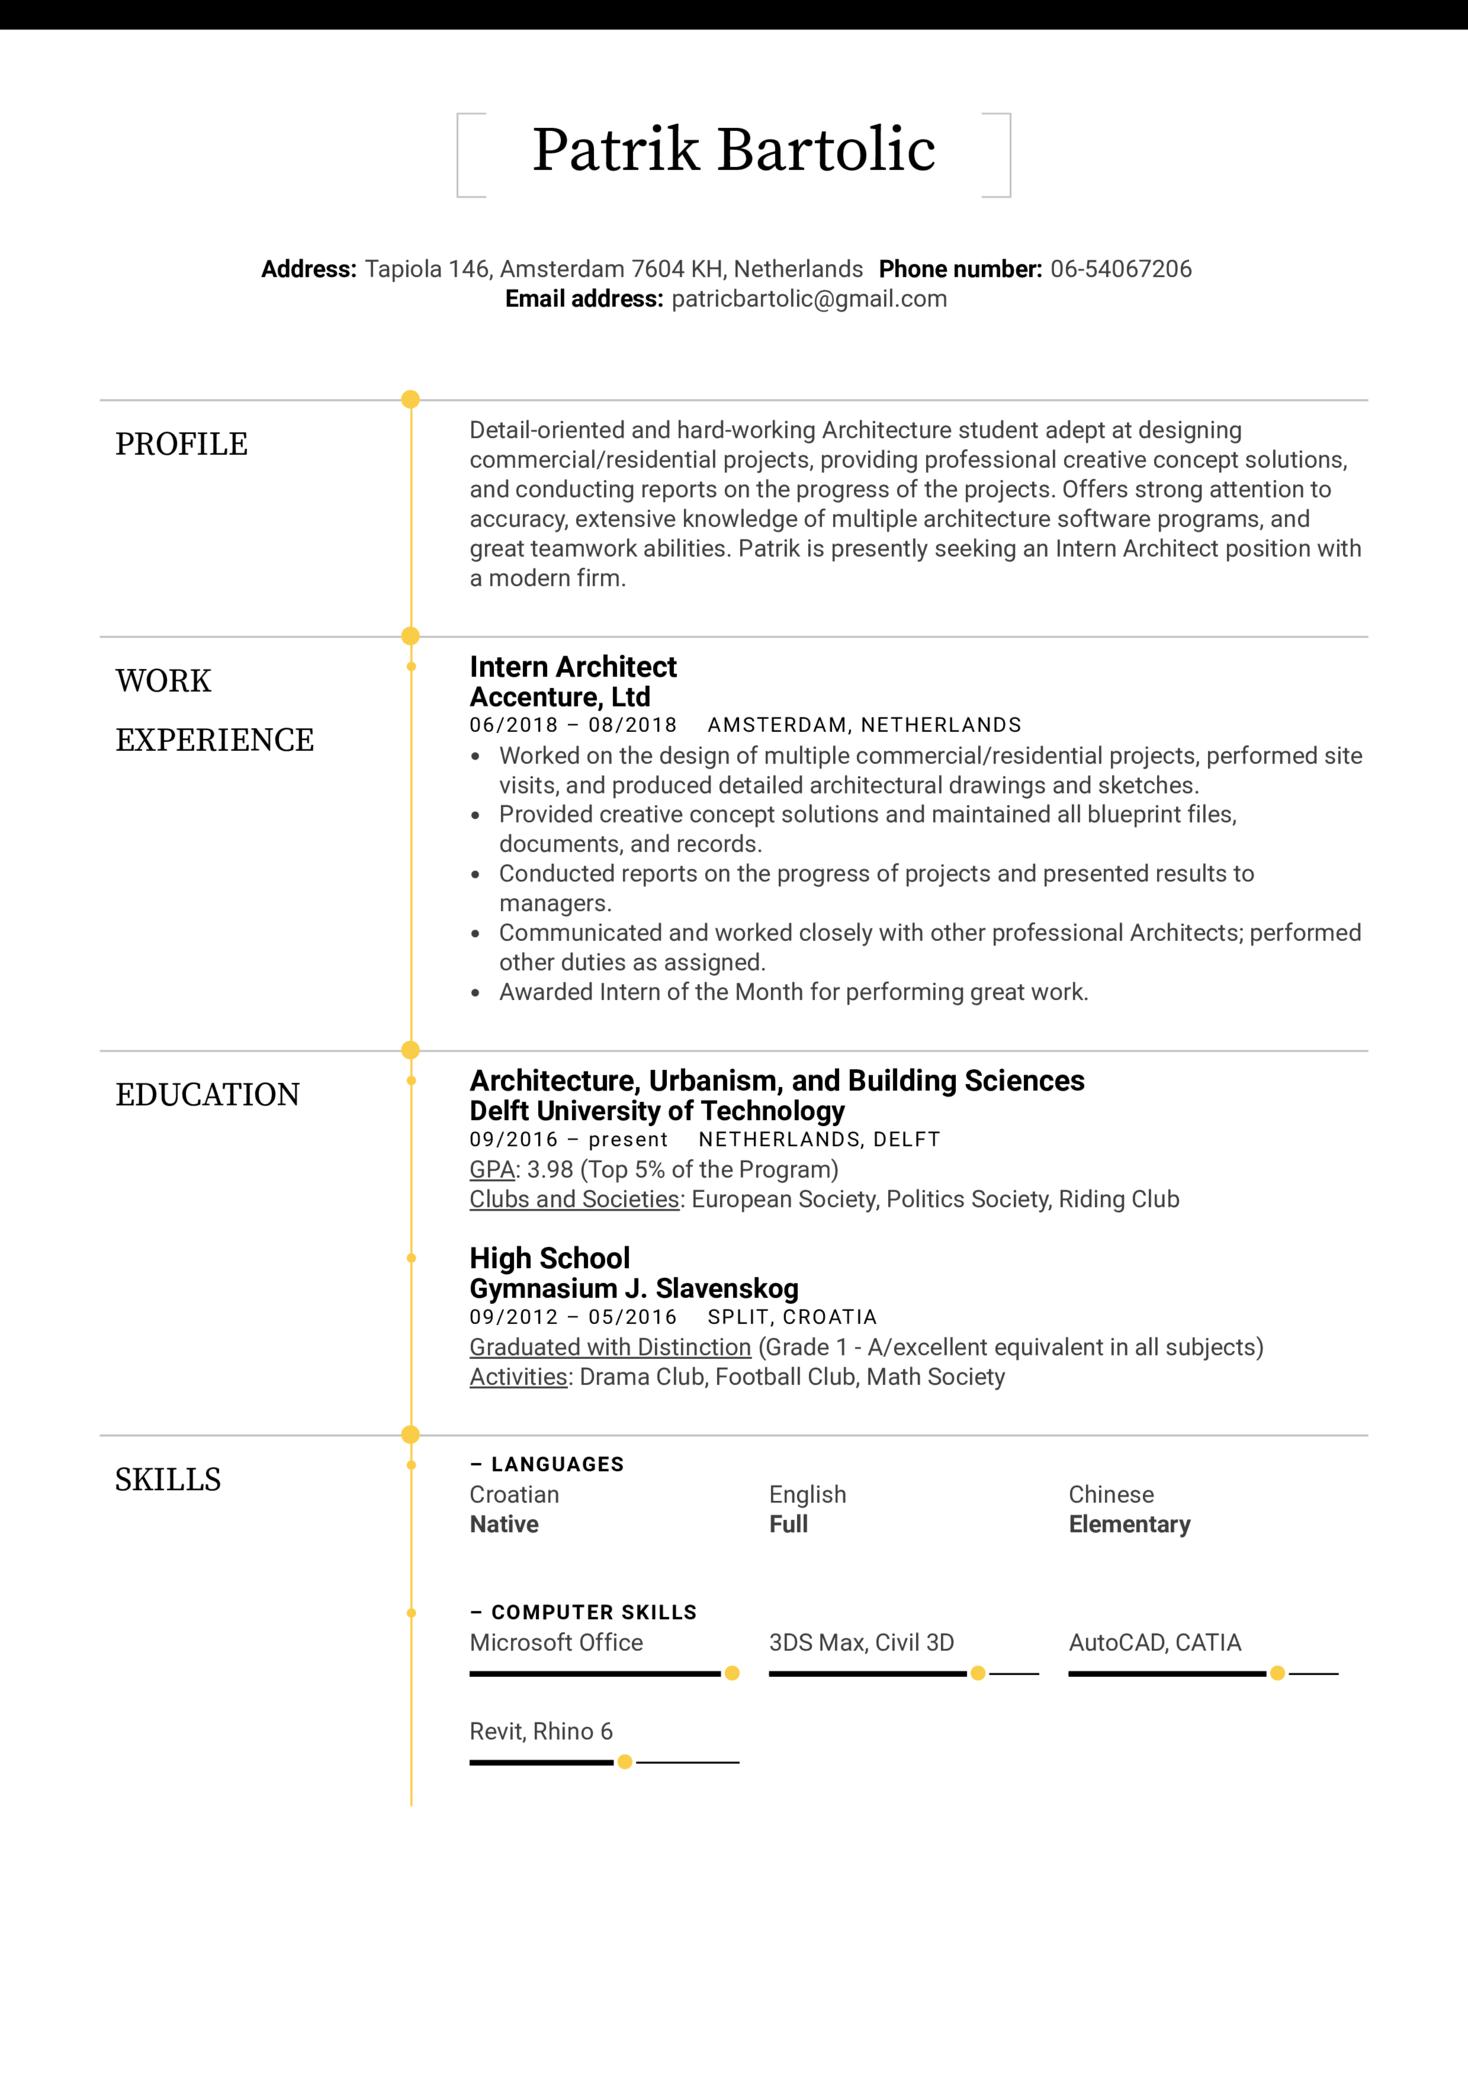 Intern Architect Resume Example (Teil 1)